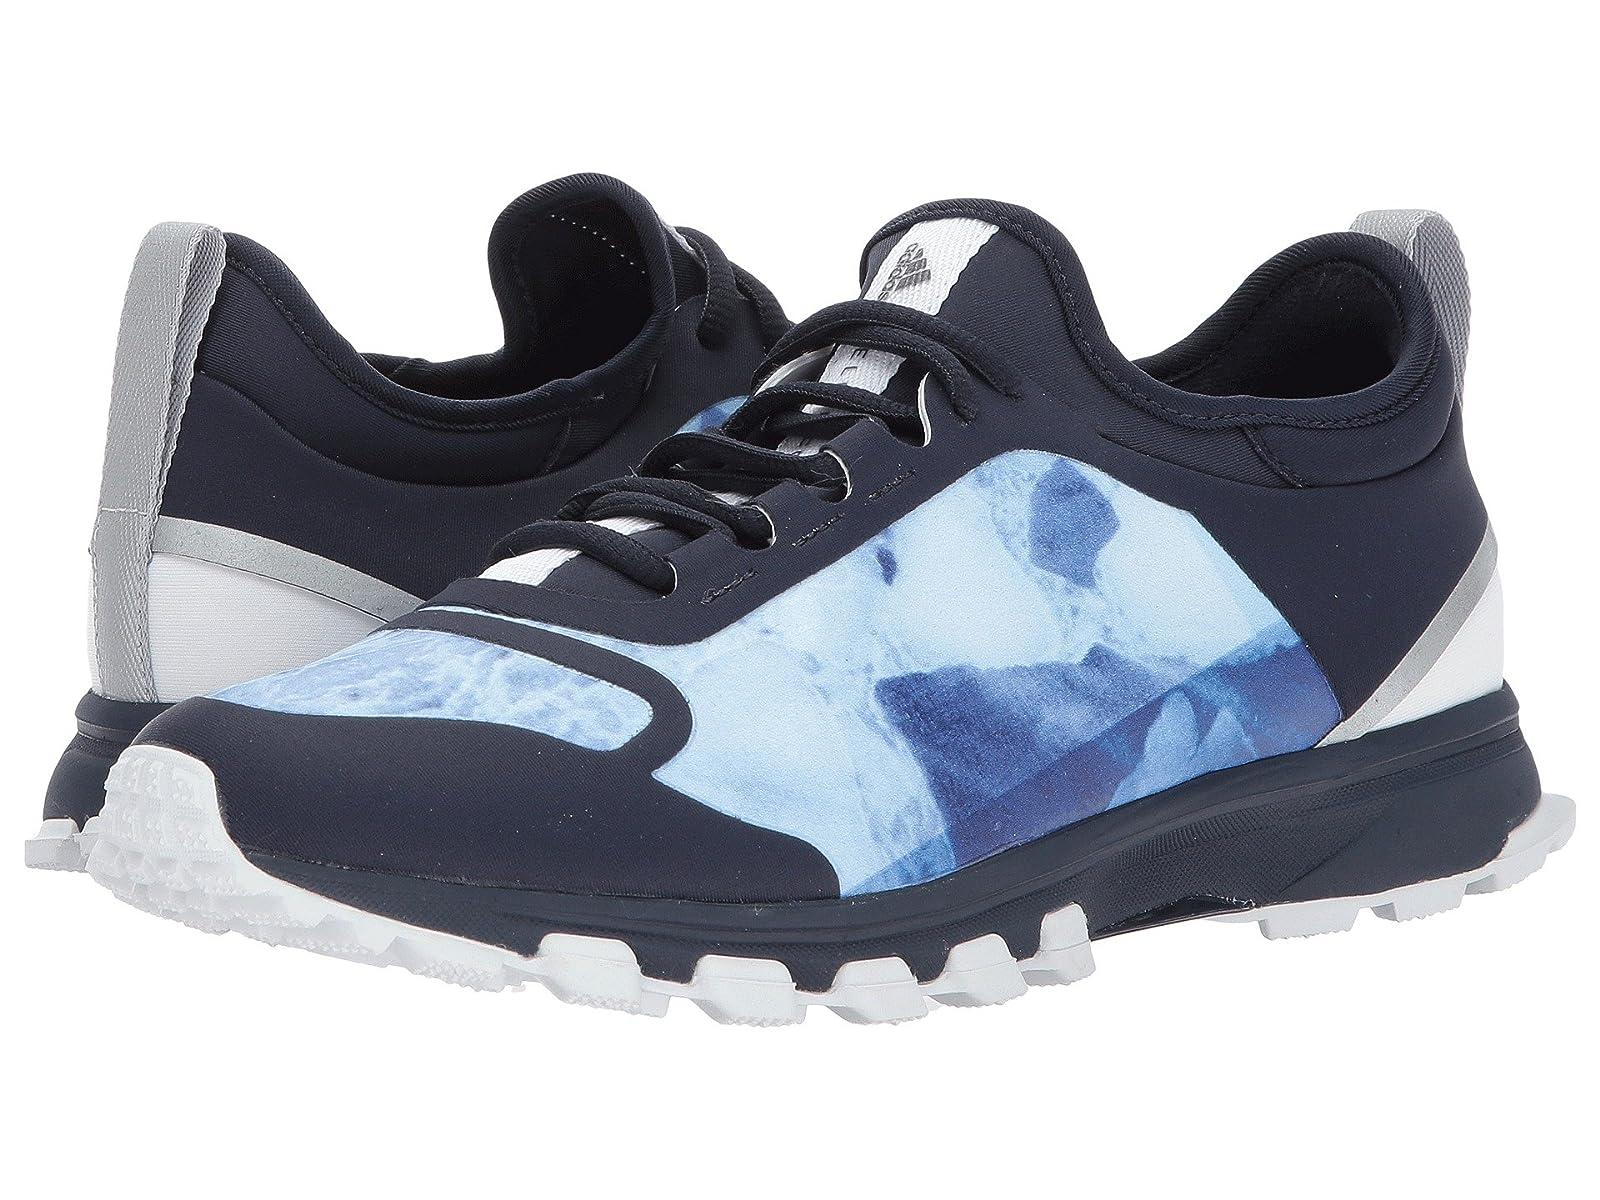 adidas by Stella McCartney Adizero XtAtmospheric grades have affordable shoes